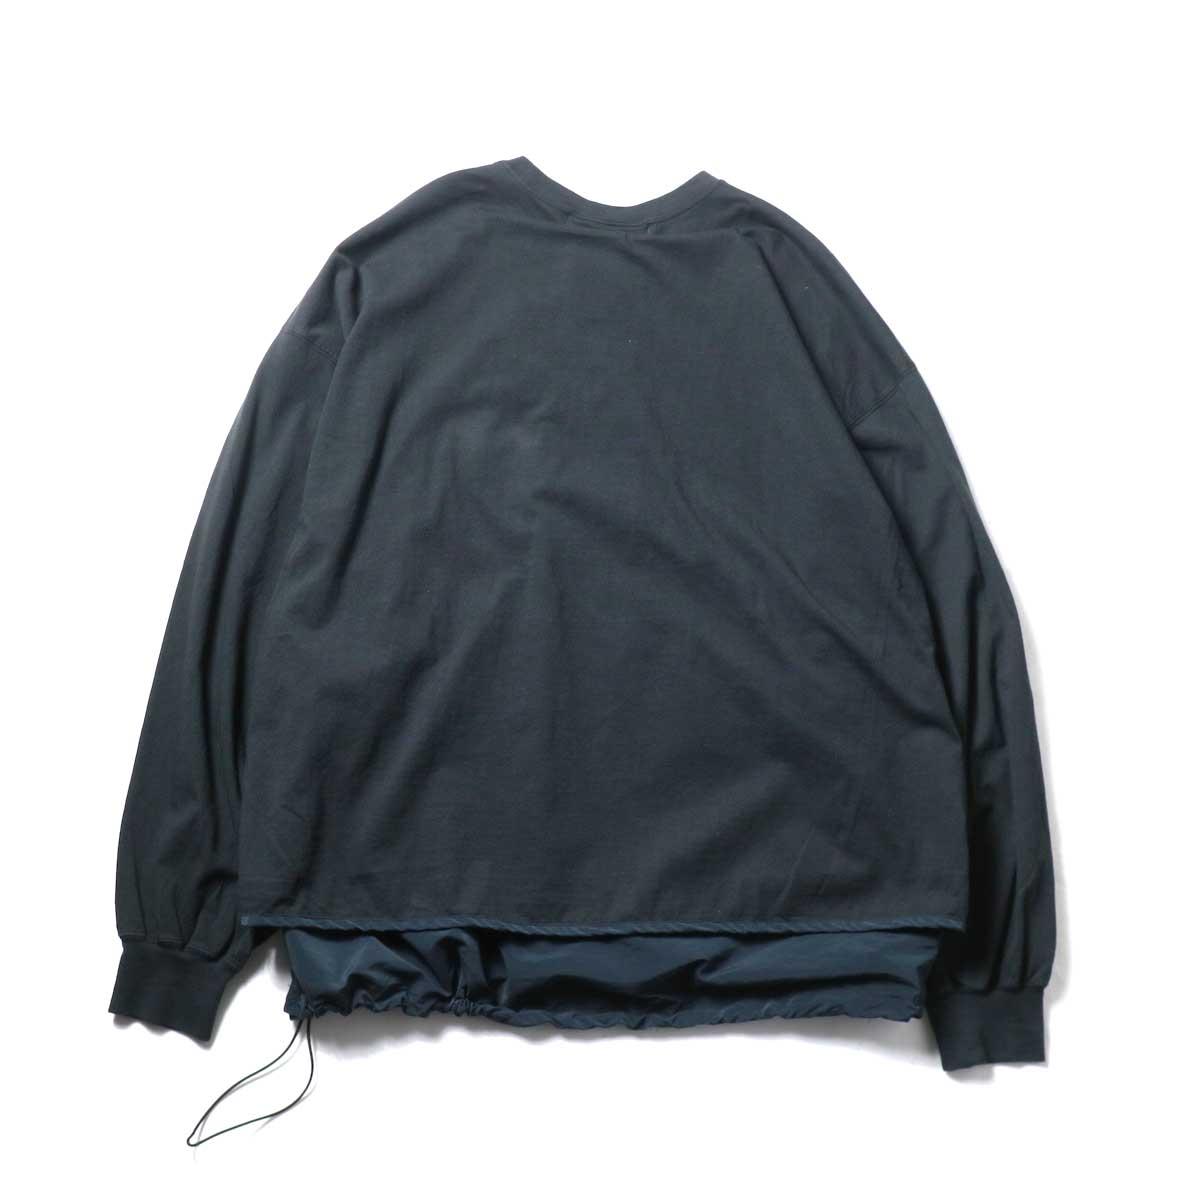 REMI RELIEF / ブリーフィング 30/天竺ベンチレーションロンT (Black)背面